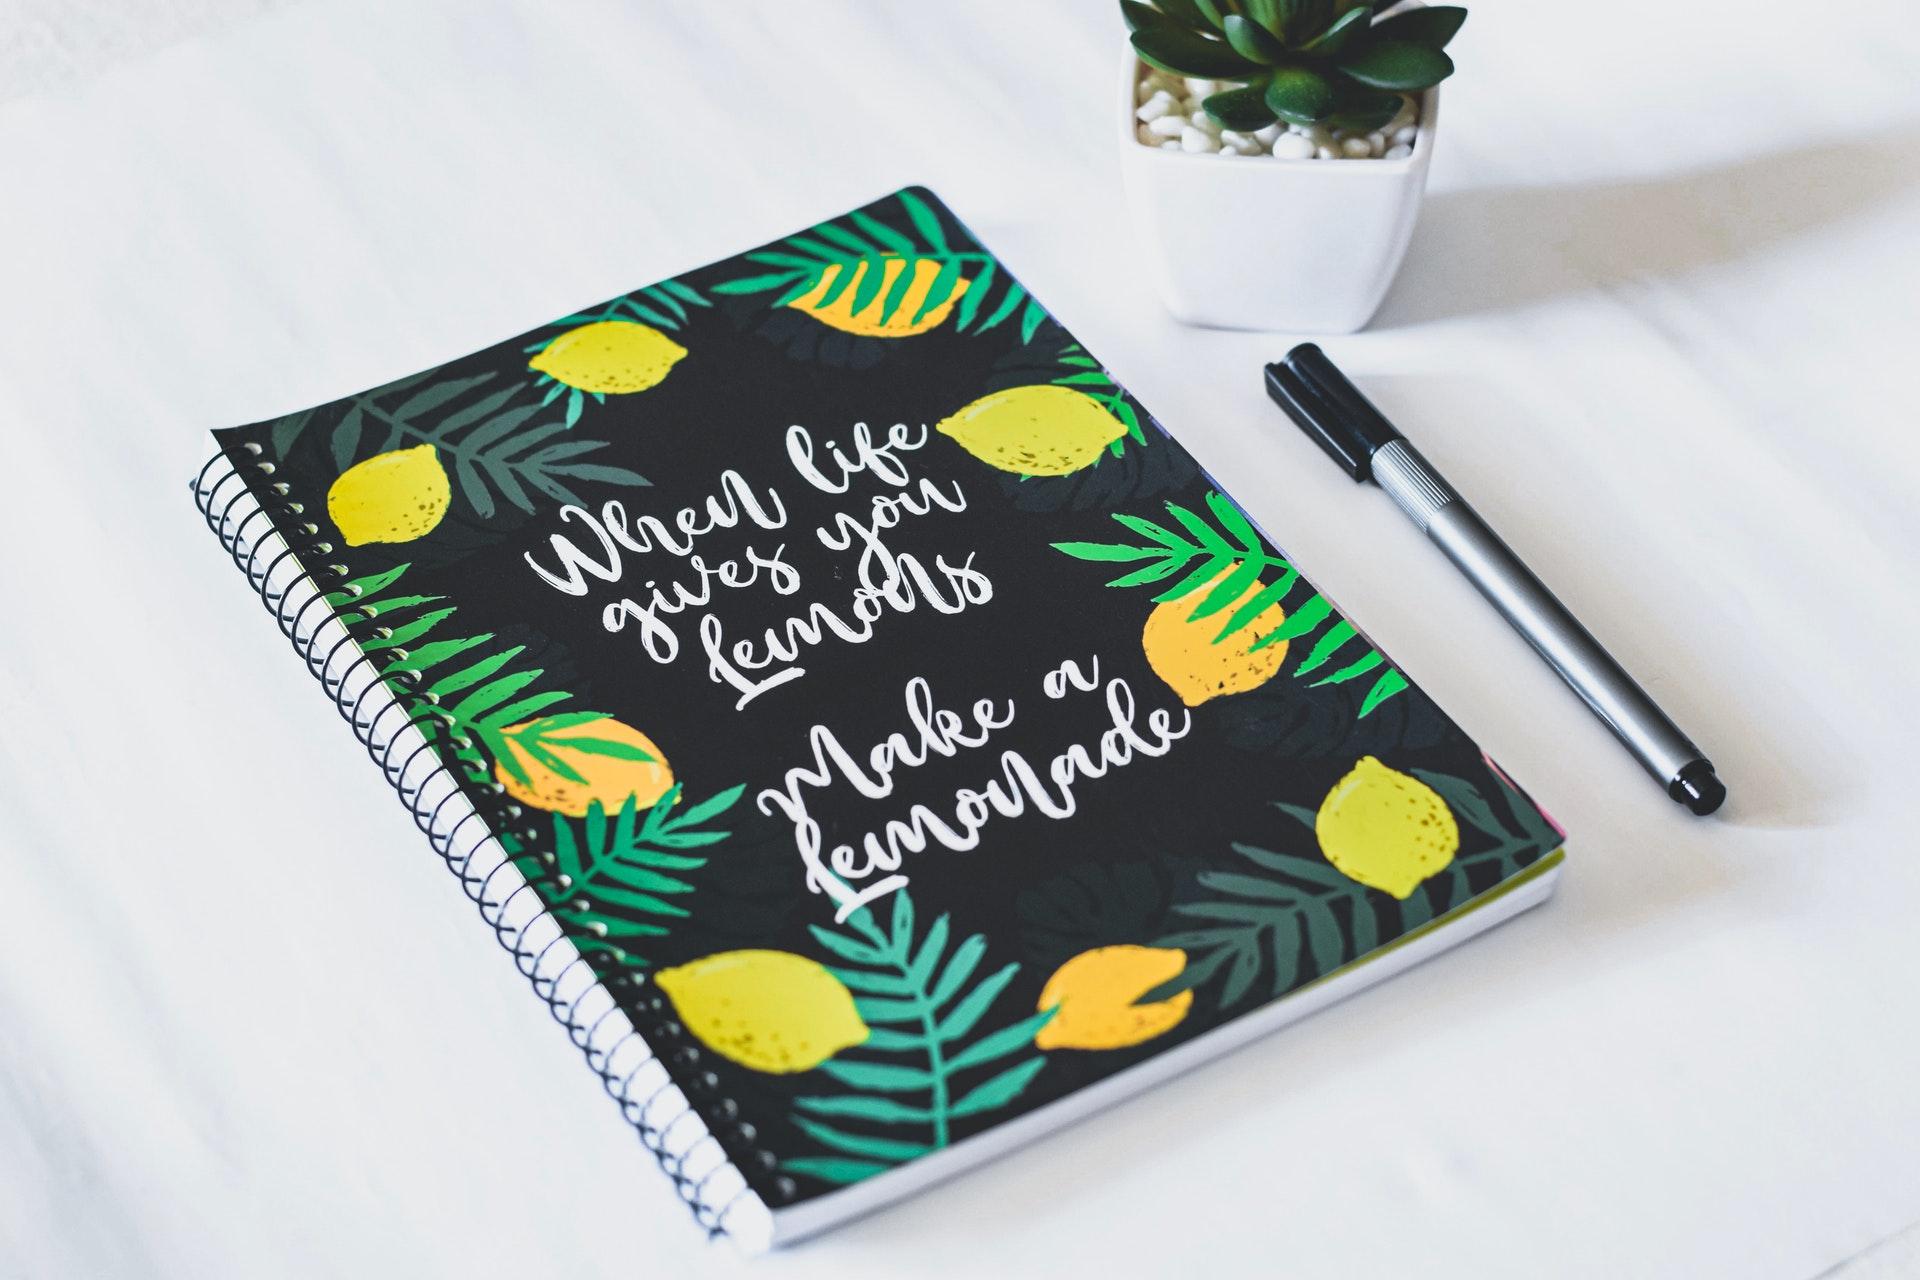 Desk with book saying when life gives you lemons make lemonade